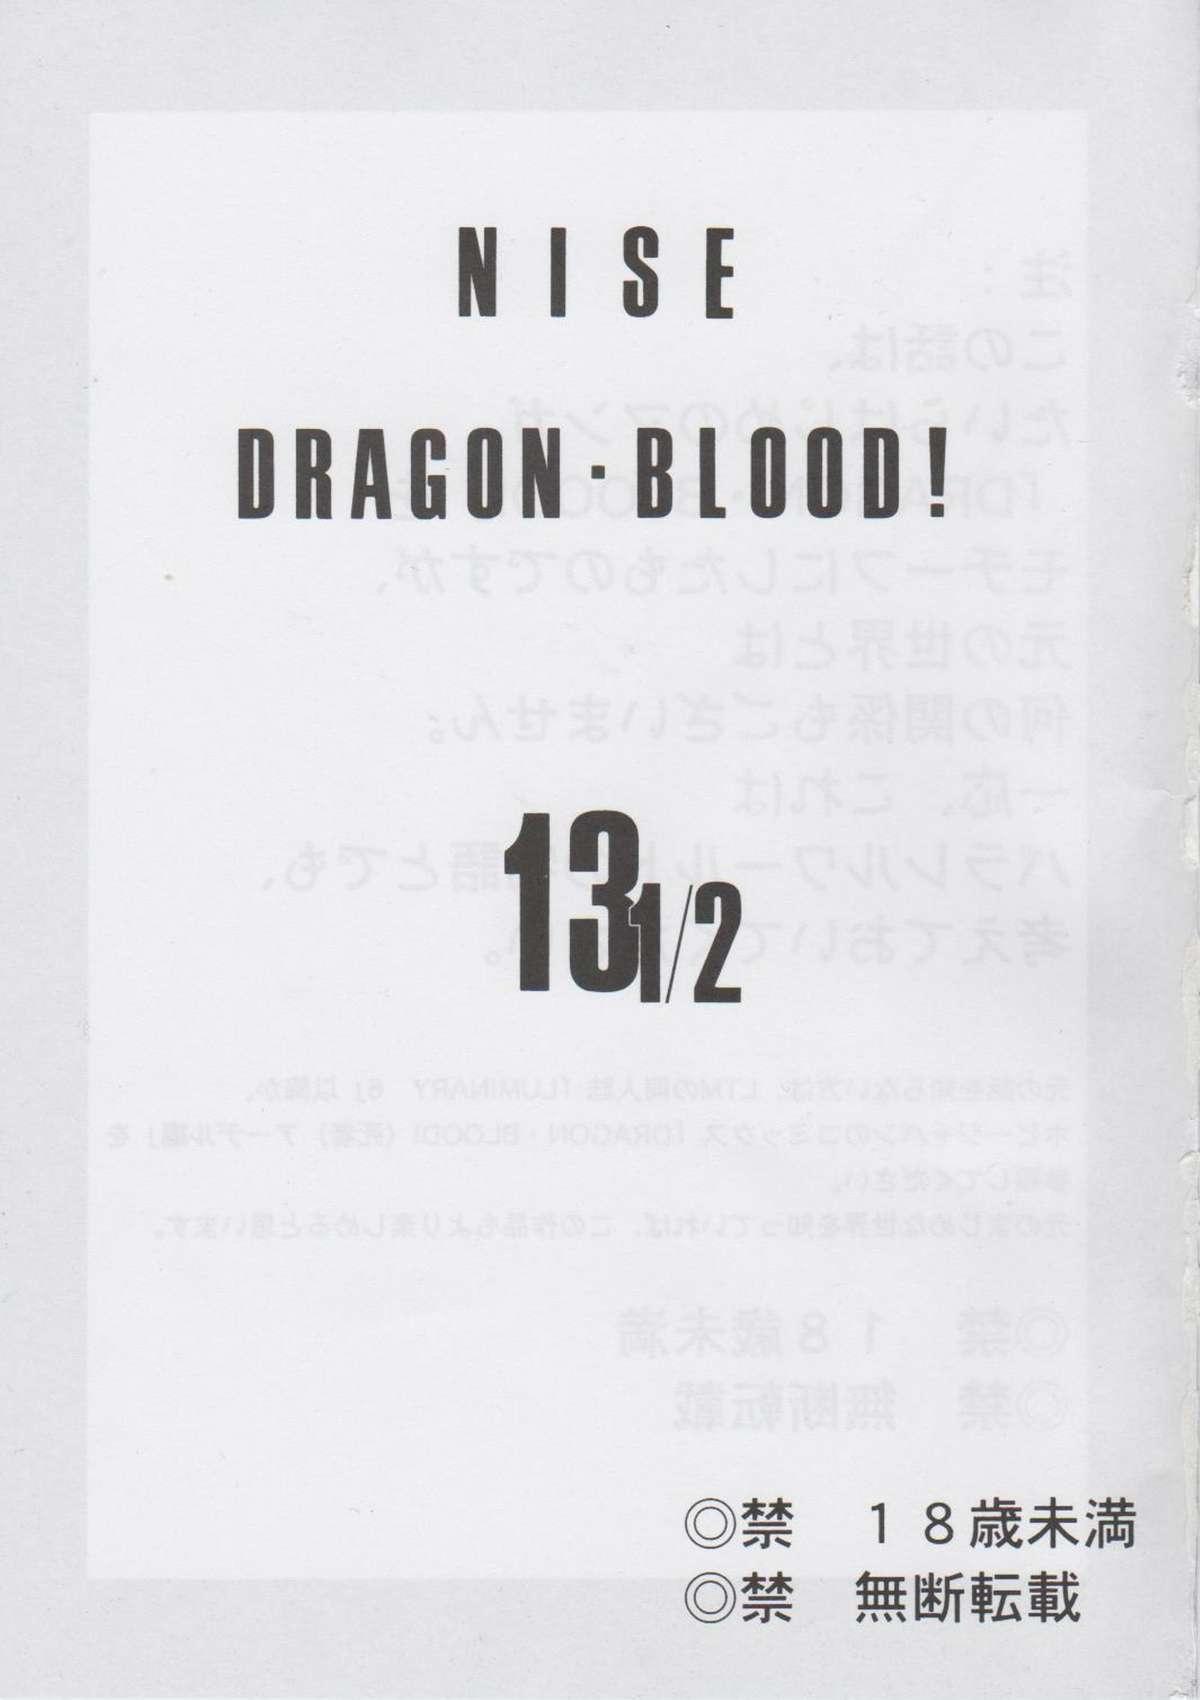 Nise Dragon Blood! 13 1/2 1